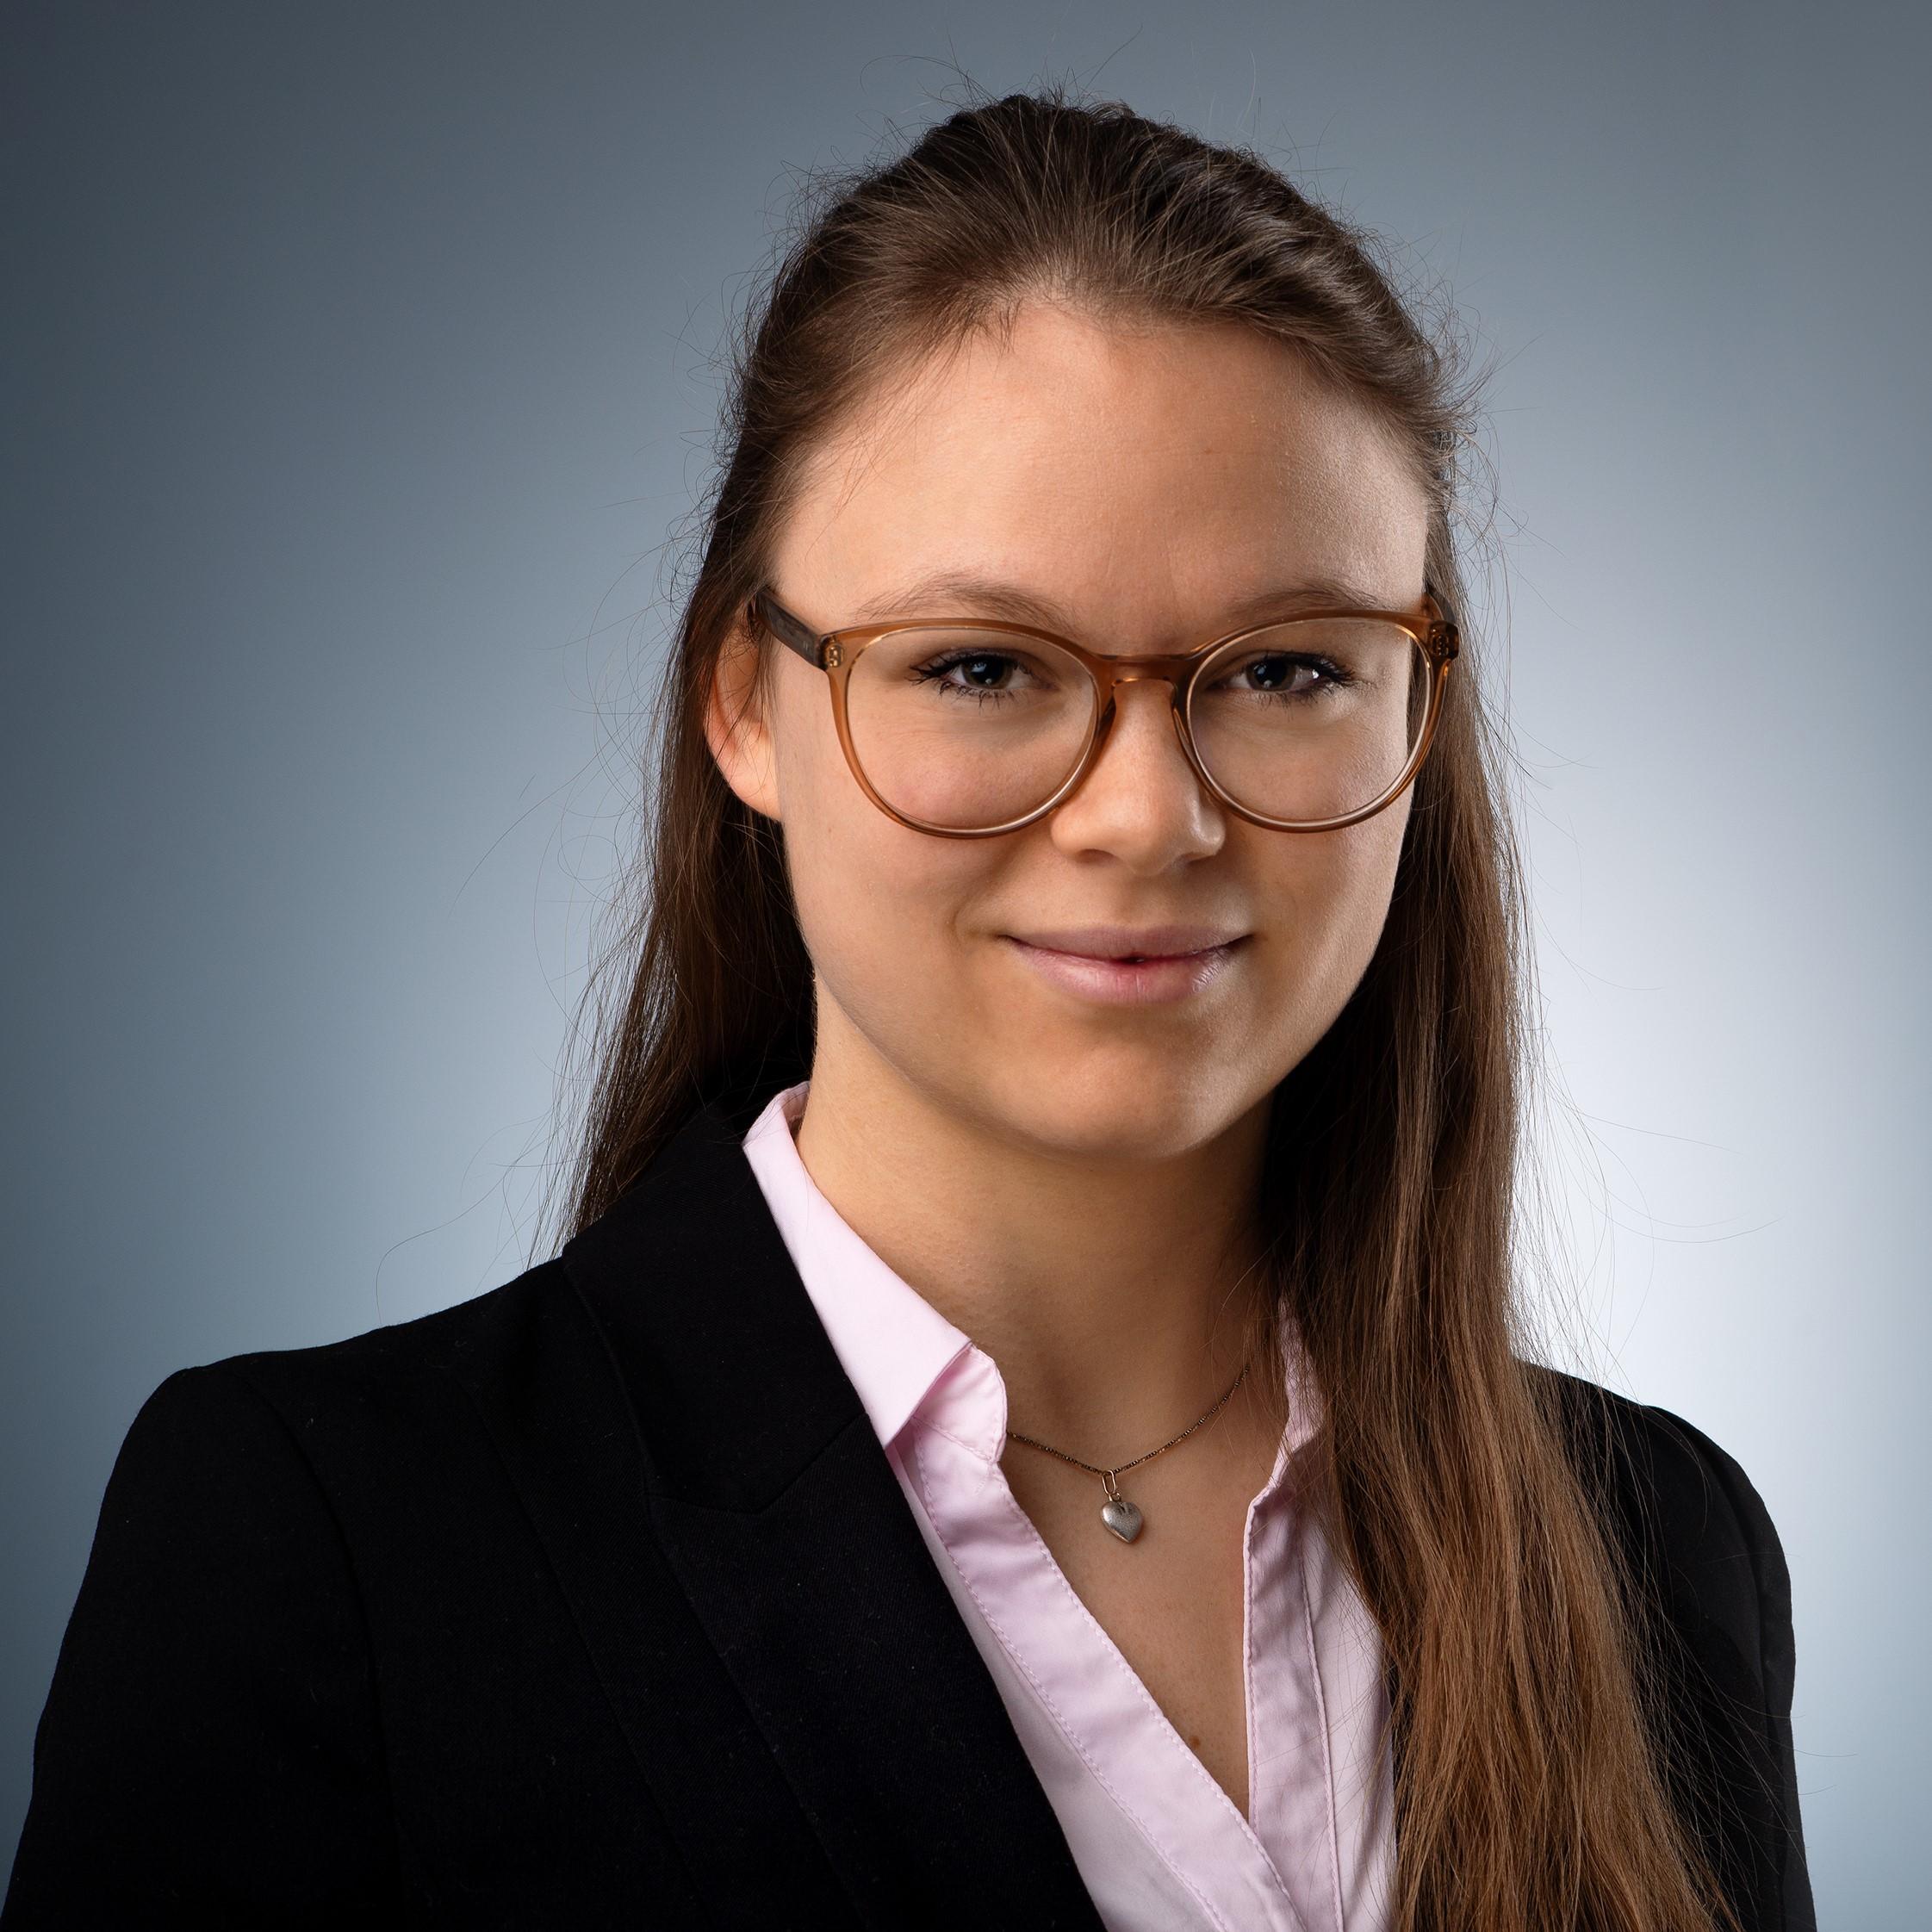 Anna-Sophia Spieler